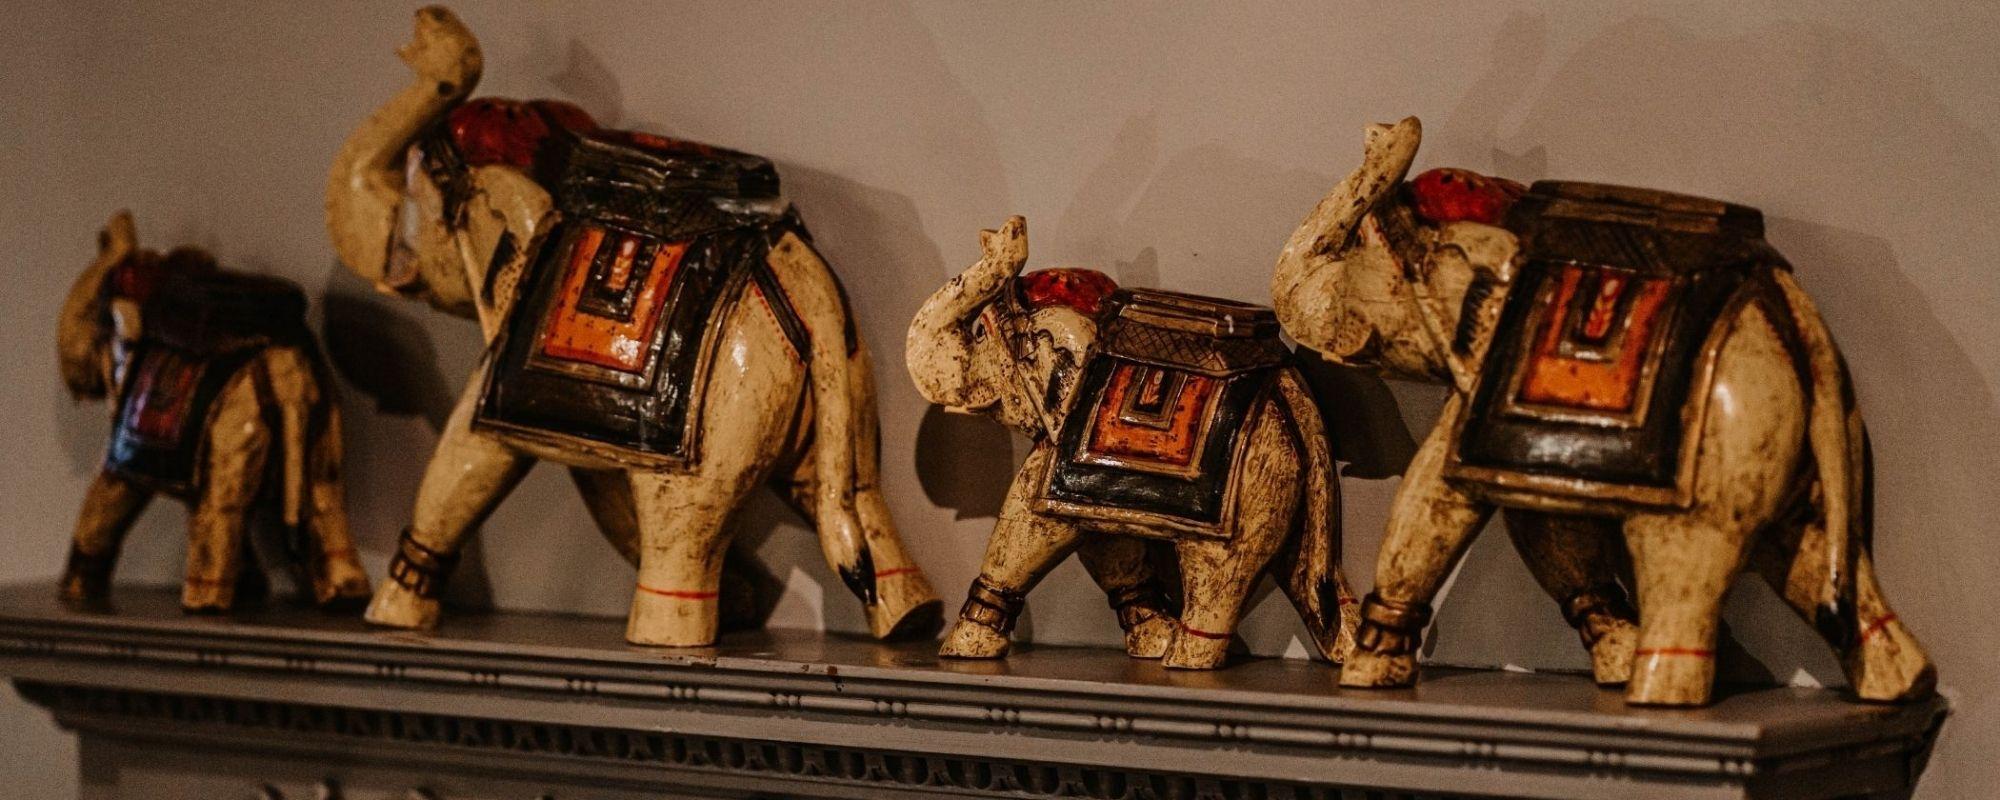 Elephant Hotel Gift Vouchers